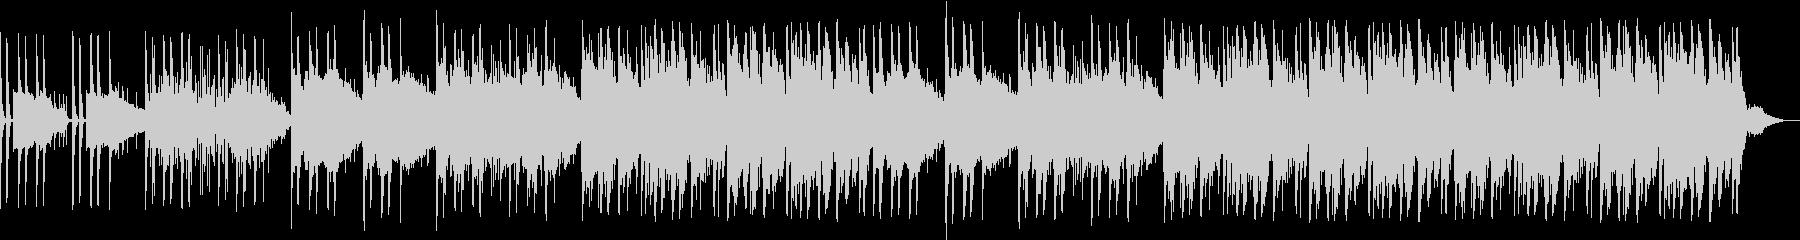 EDM  Track 15の未再生の波形